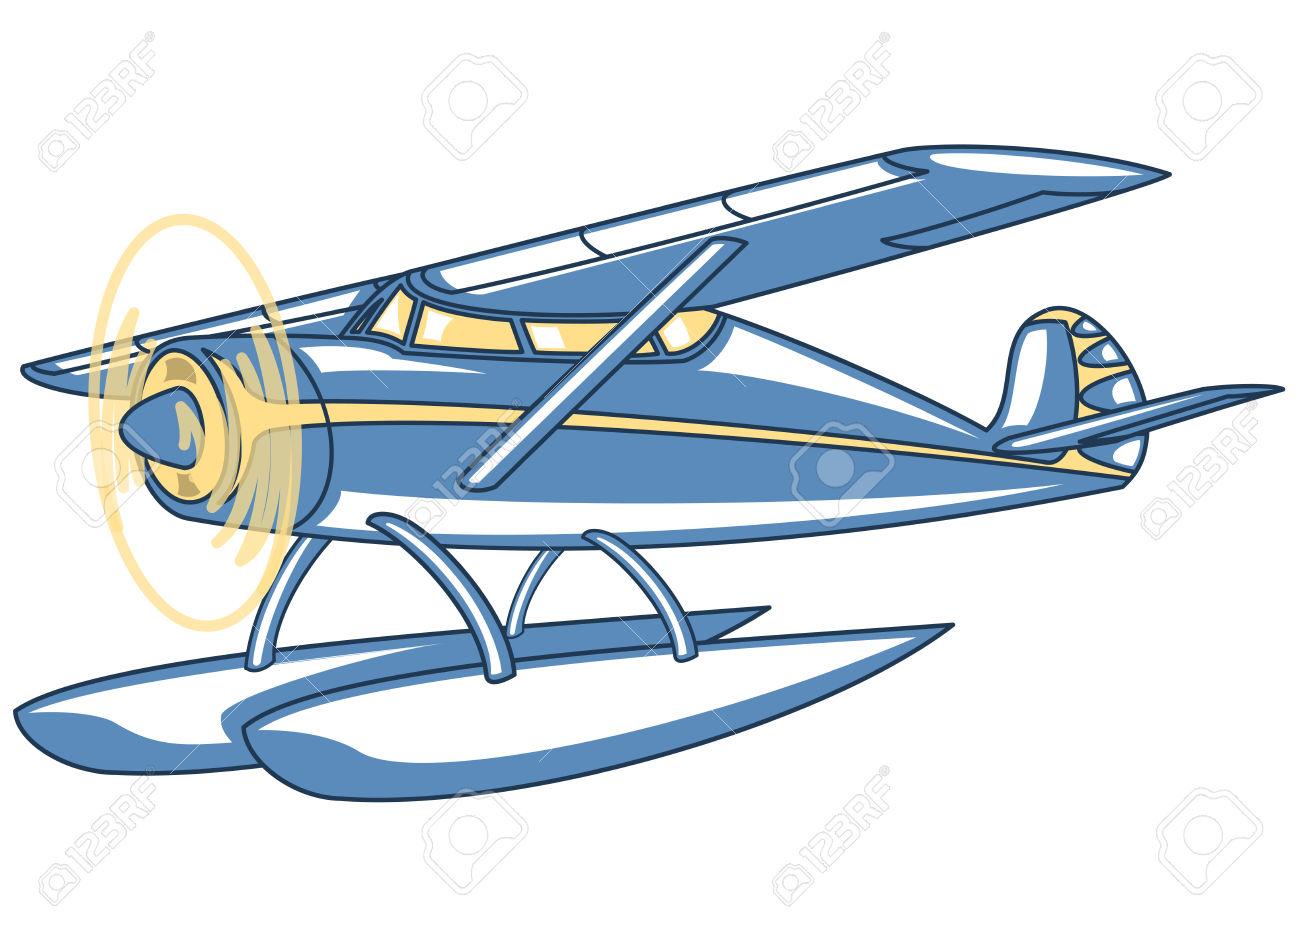 Vector Retro Seaplane. Illustration Clip Art Royalty Free Cliparts.